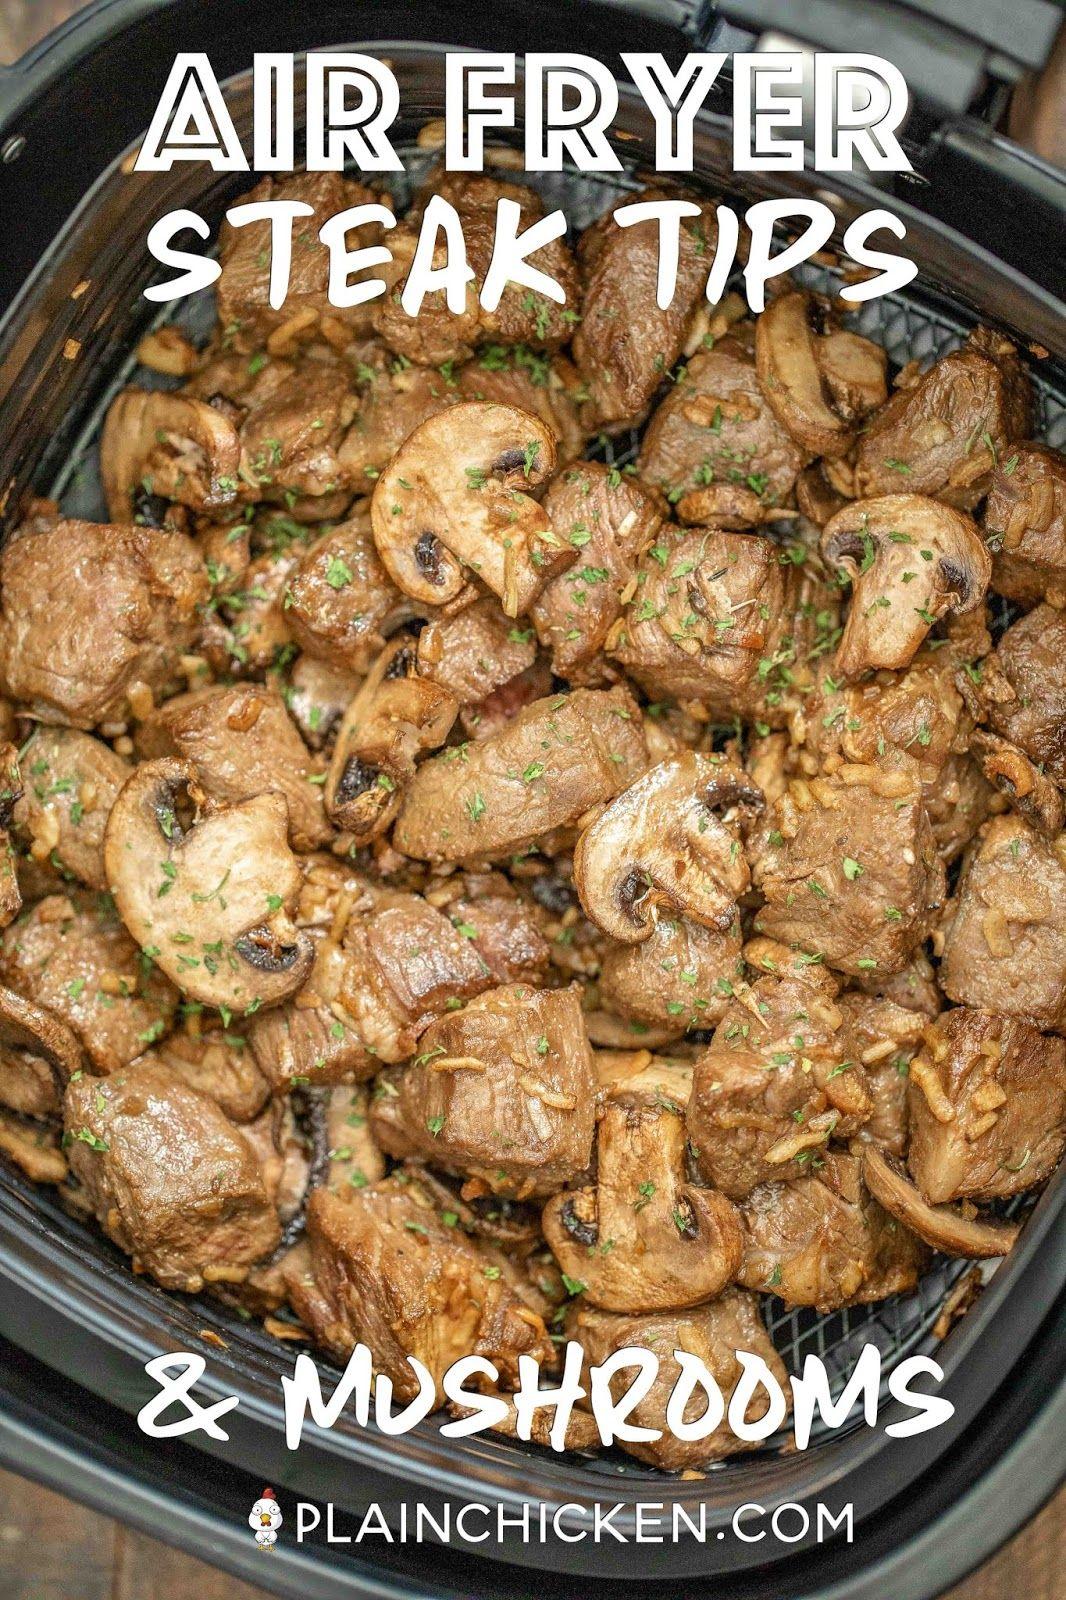 Air Fryer Steak Tips Mushrooms Our Favorite Steak Dinner Only